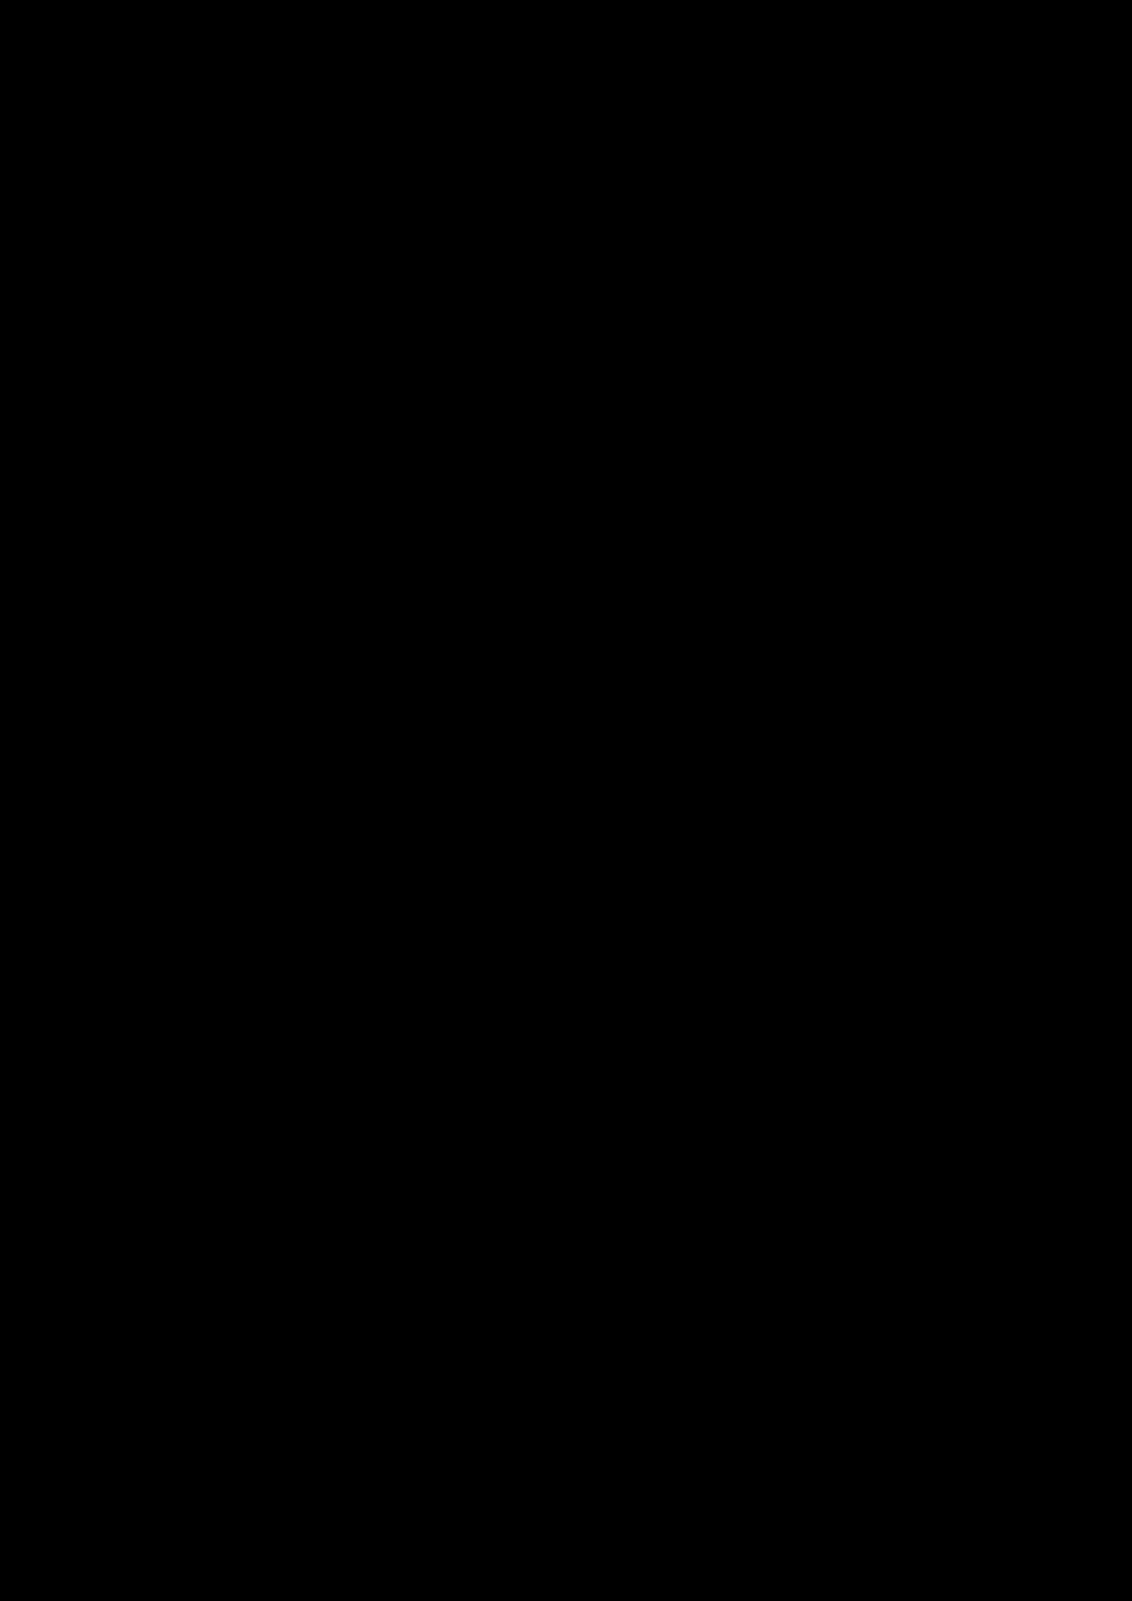 Ten lyubvi slide, Image 58